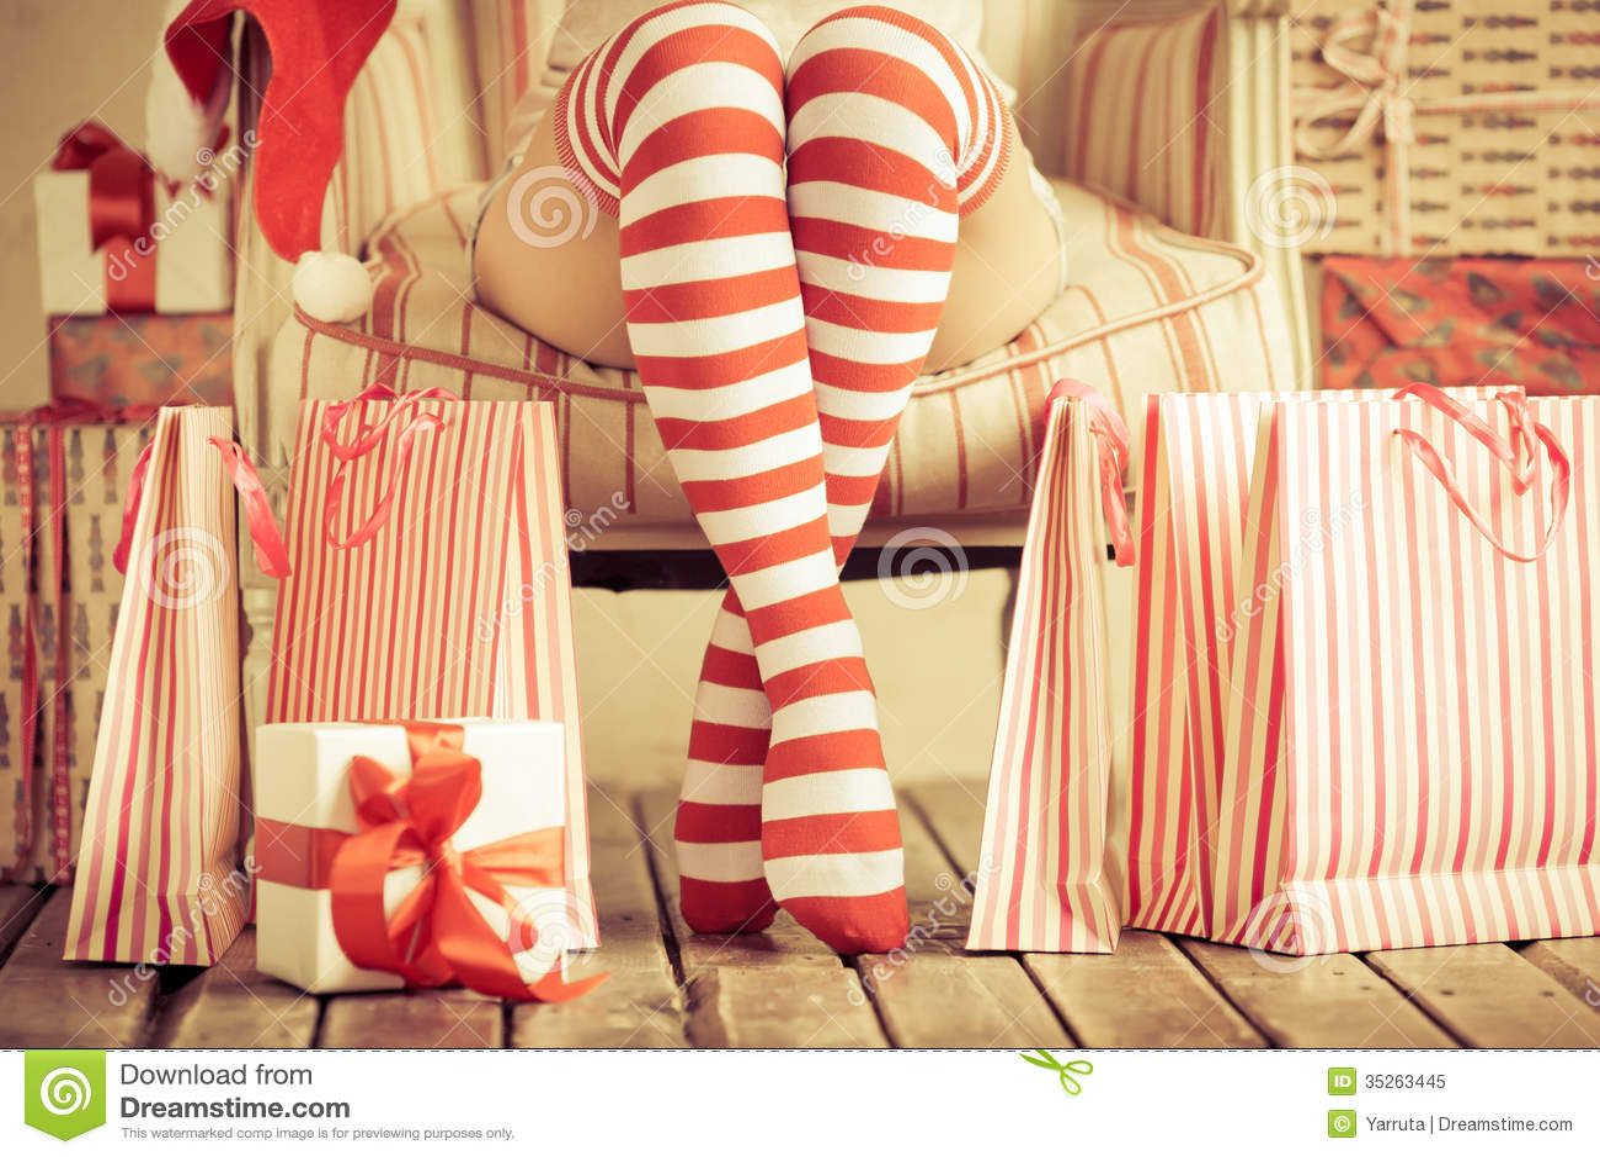 Christmas Royalty Free Stock Photo Image 35263445